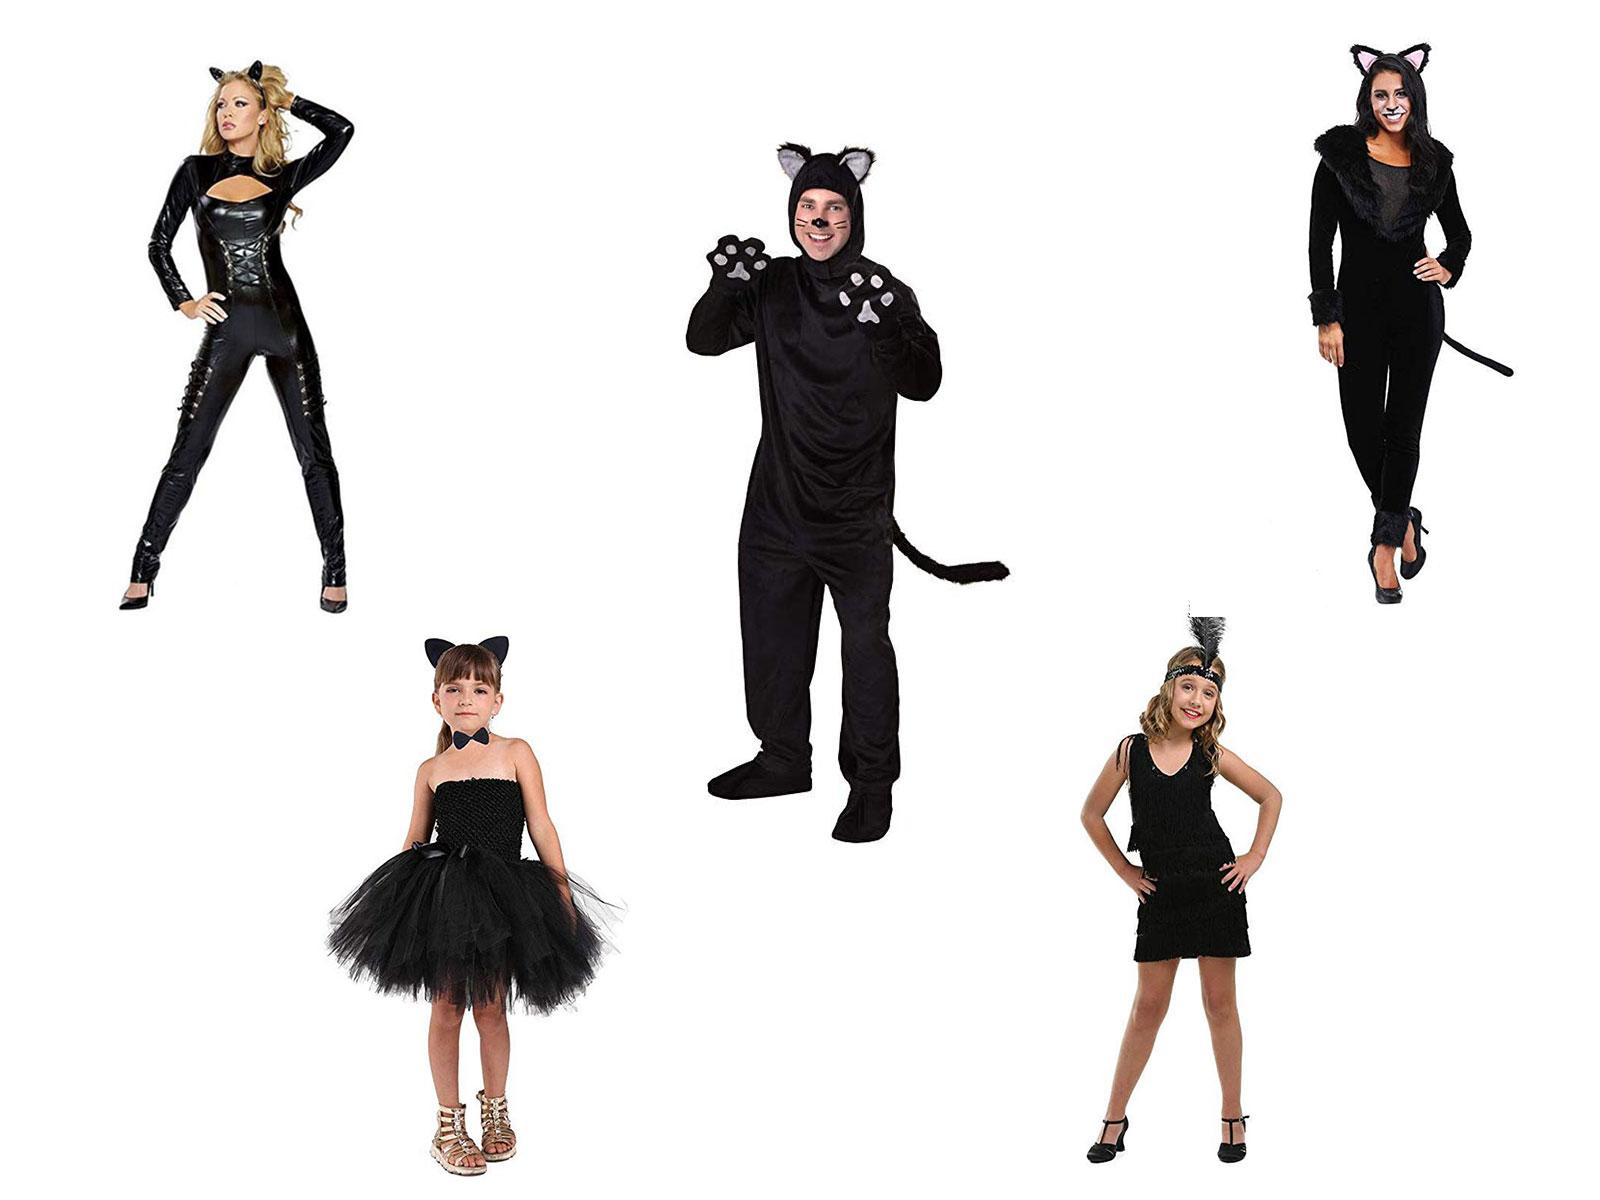 12-Halloween-Black-Cat-Costume-Ideas-For-Kids-Men-Women-2019-F